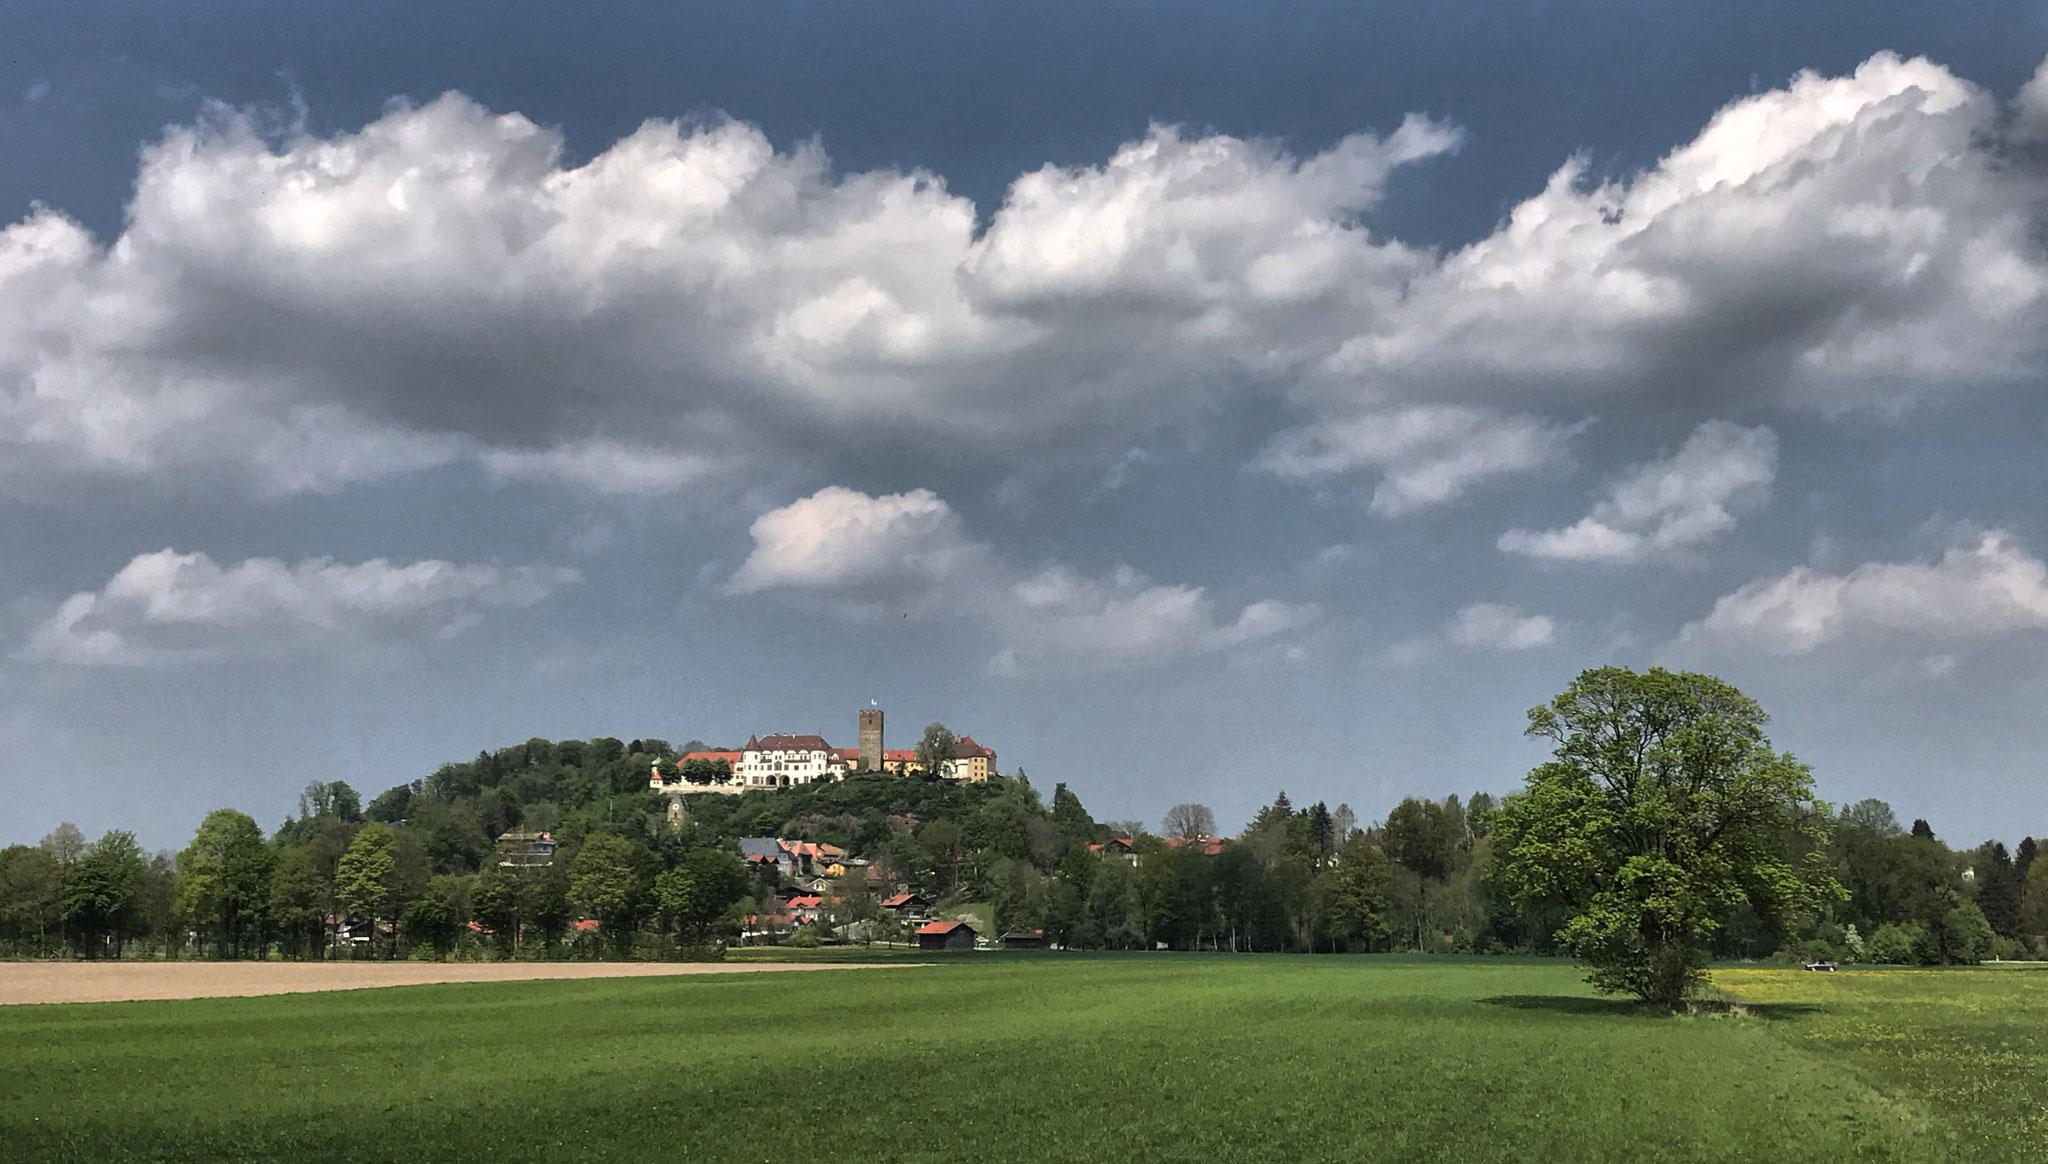 Etappe O03: Rohrdorf - Neubeuern